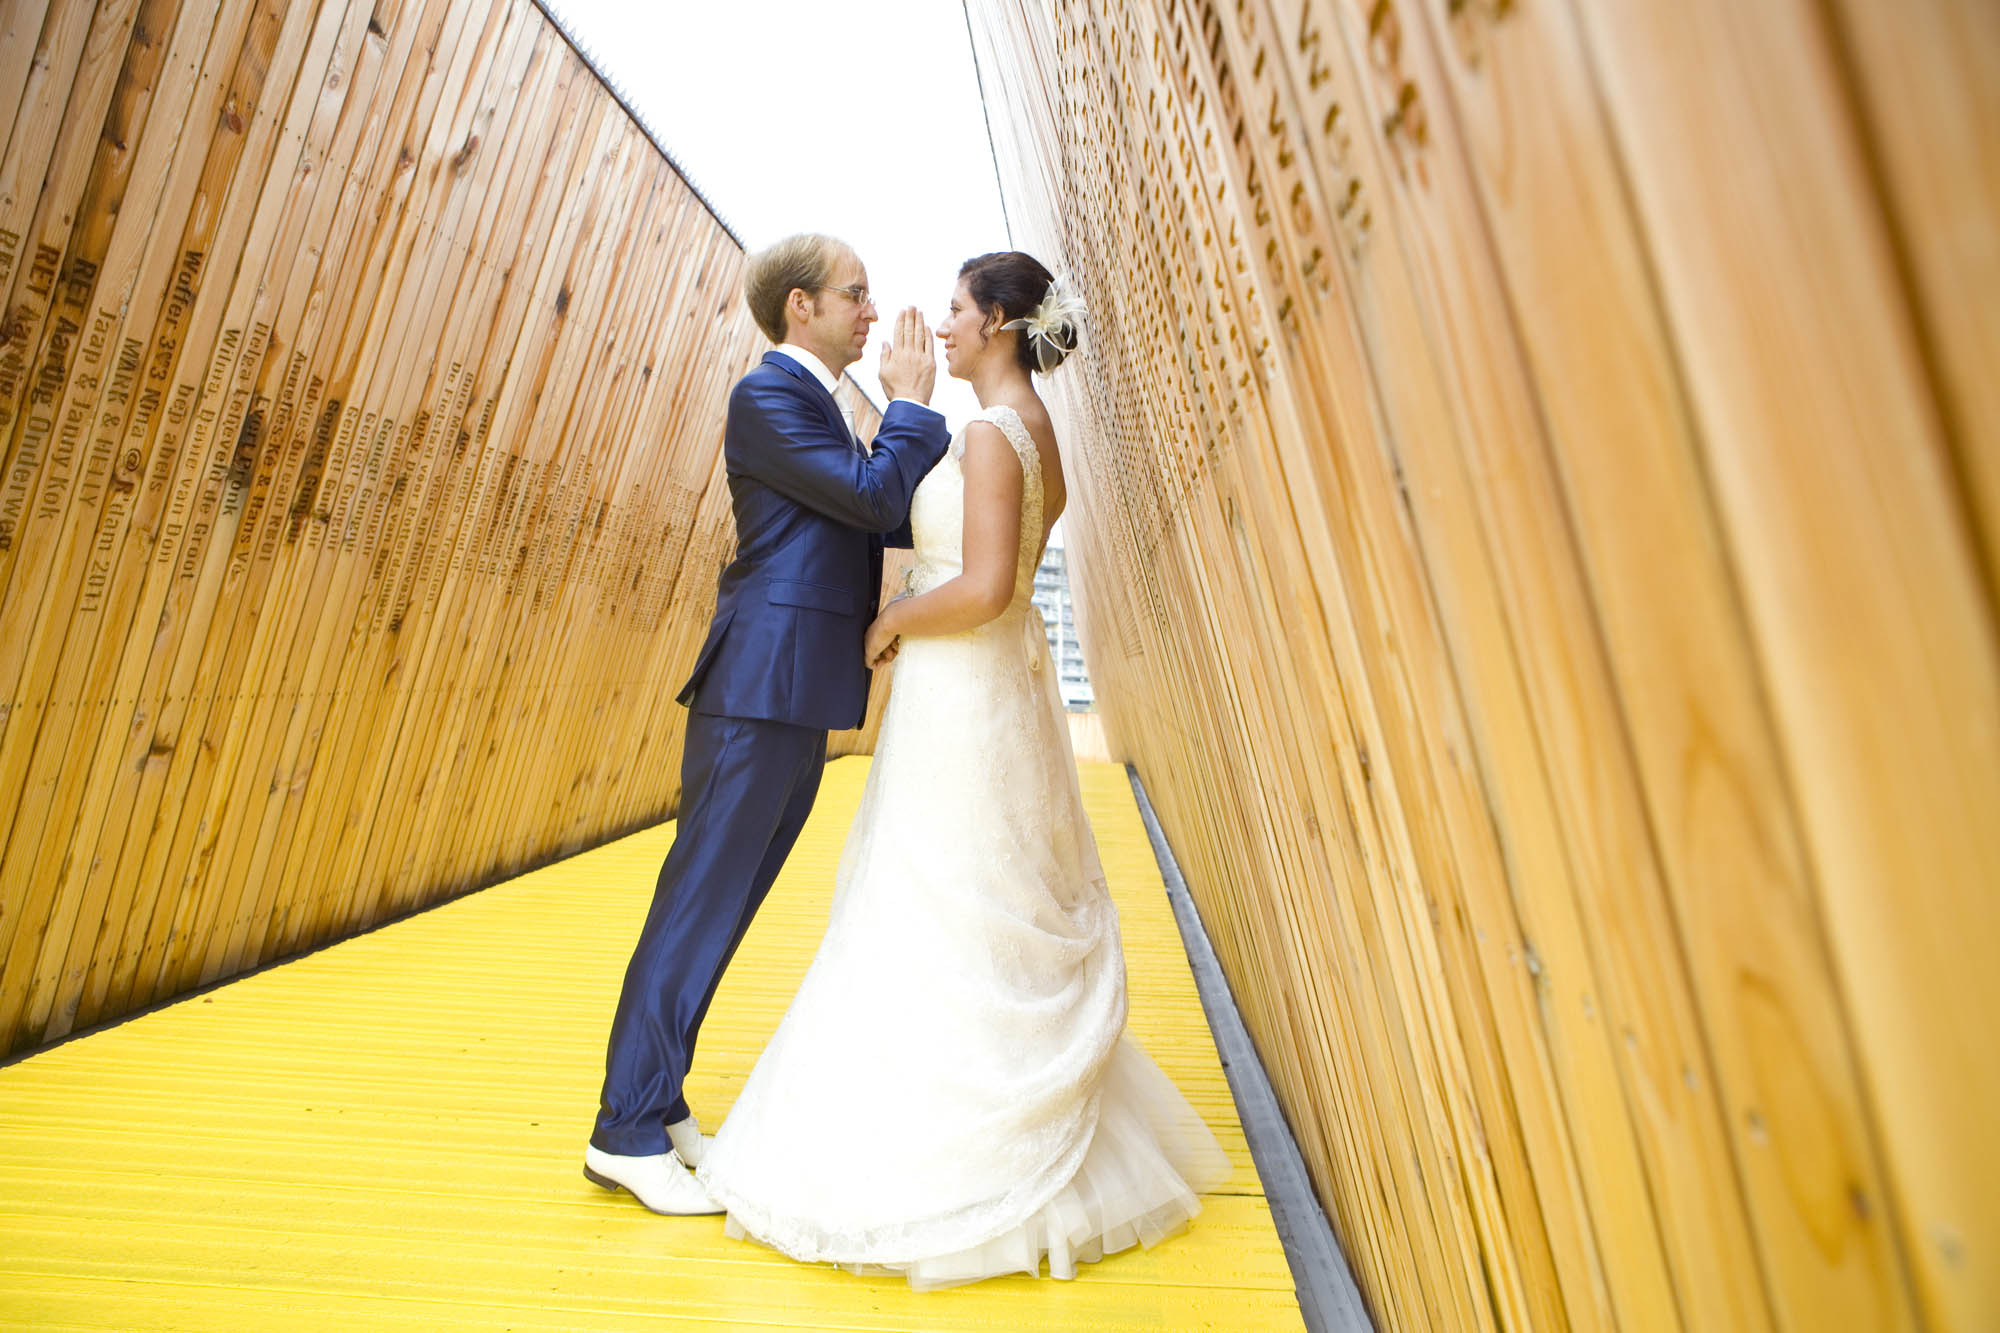 Bruidsfotografie bruiloft Kuyl's Fundatie Rotterdam bruidspaar Luchtsingel gele brug Rotterdam